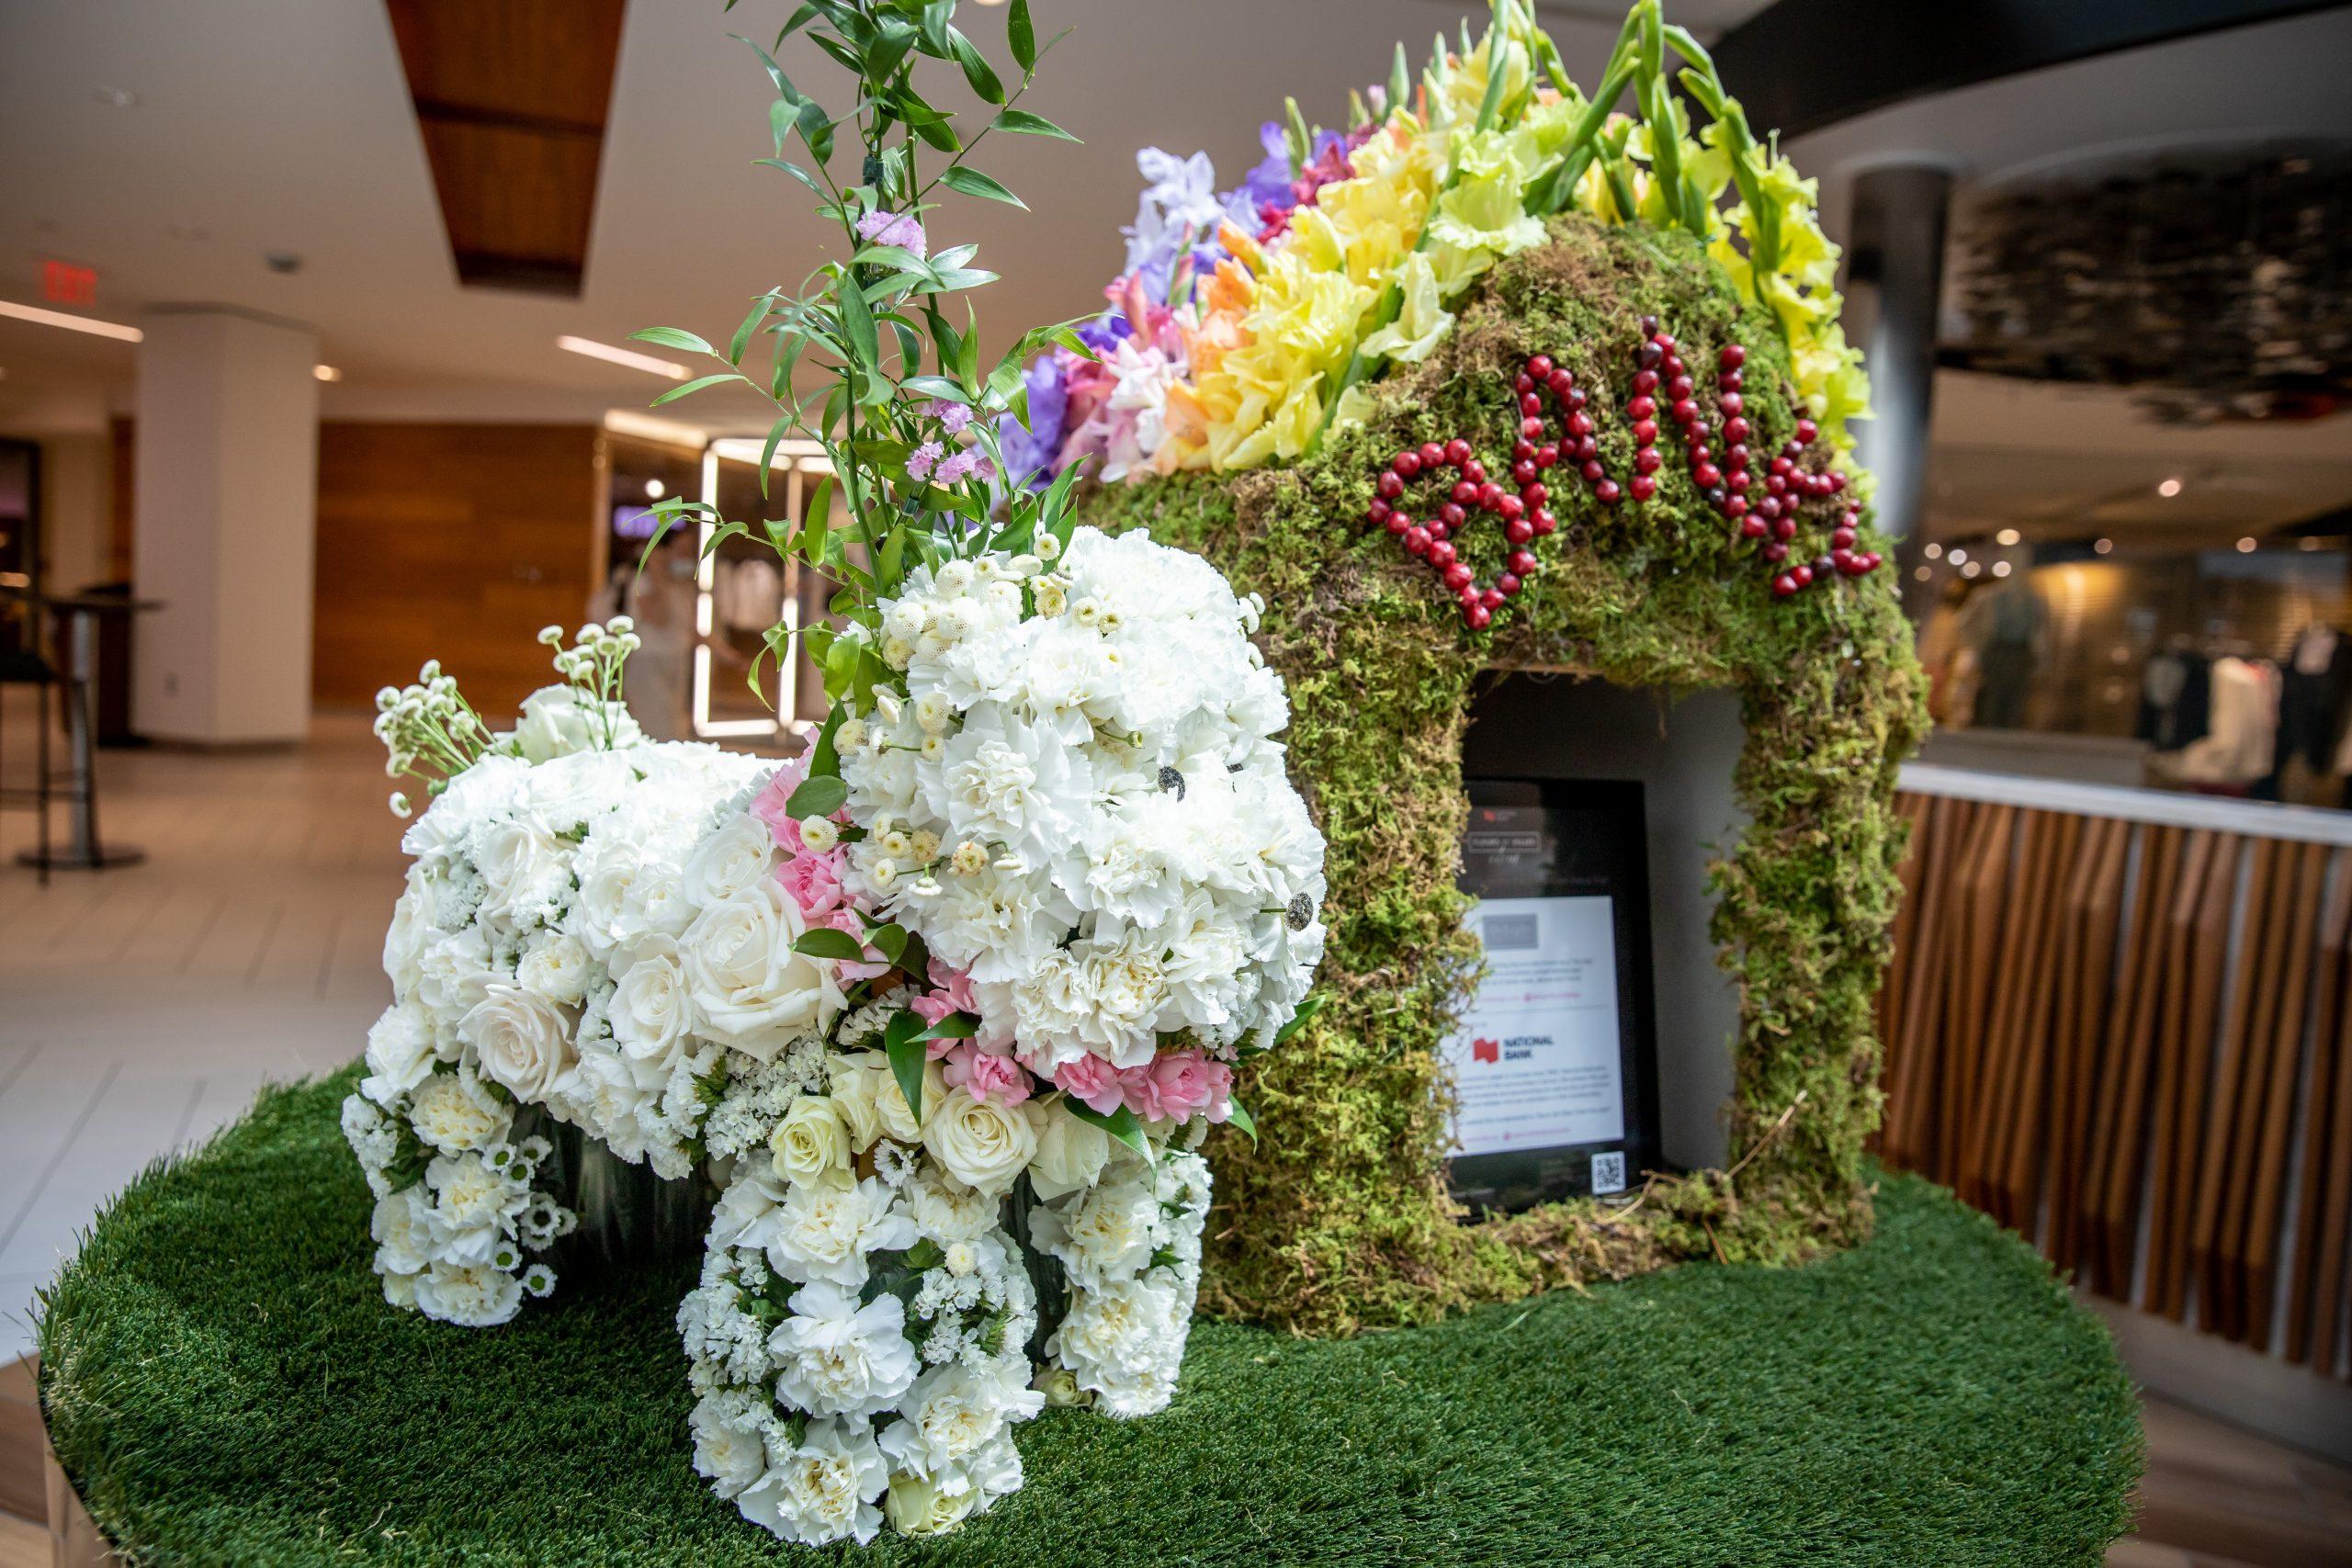 fleurs de villes chien display made of fresh white flowers